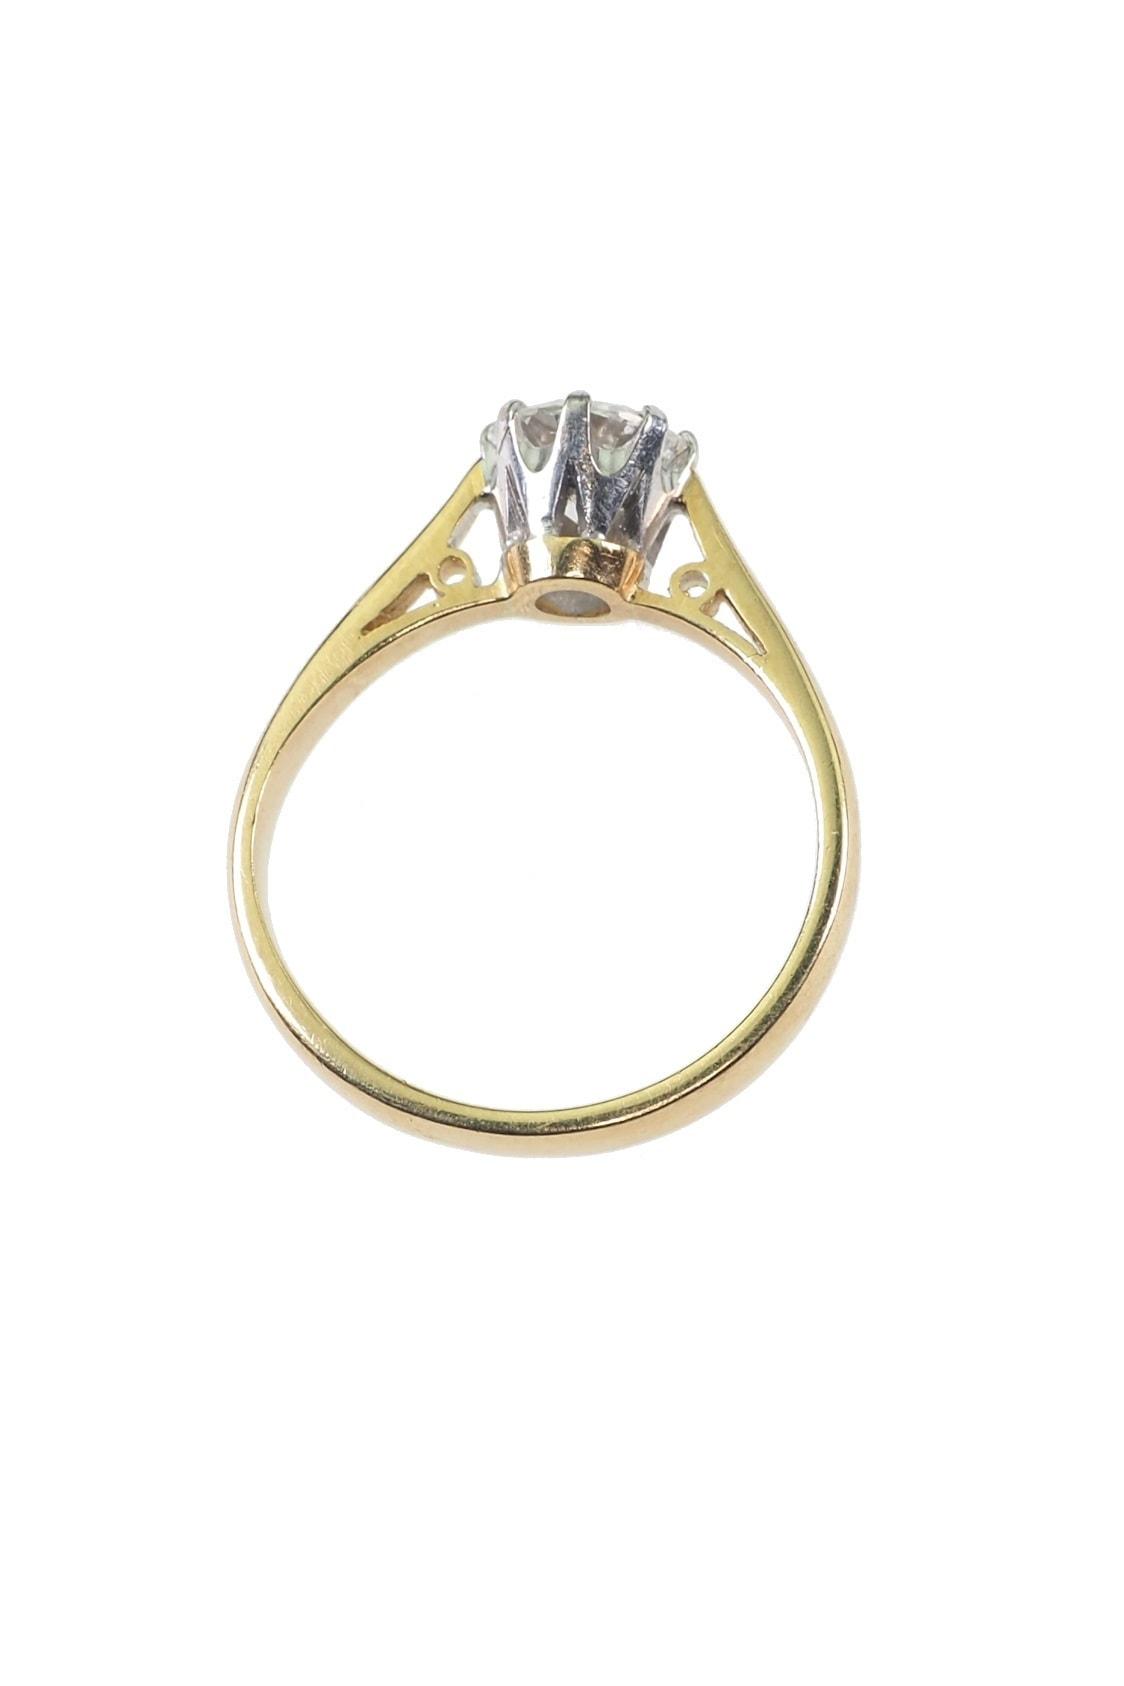 zertifizierten-Diamantschmuck-kaufen-0226c